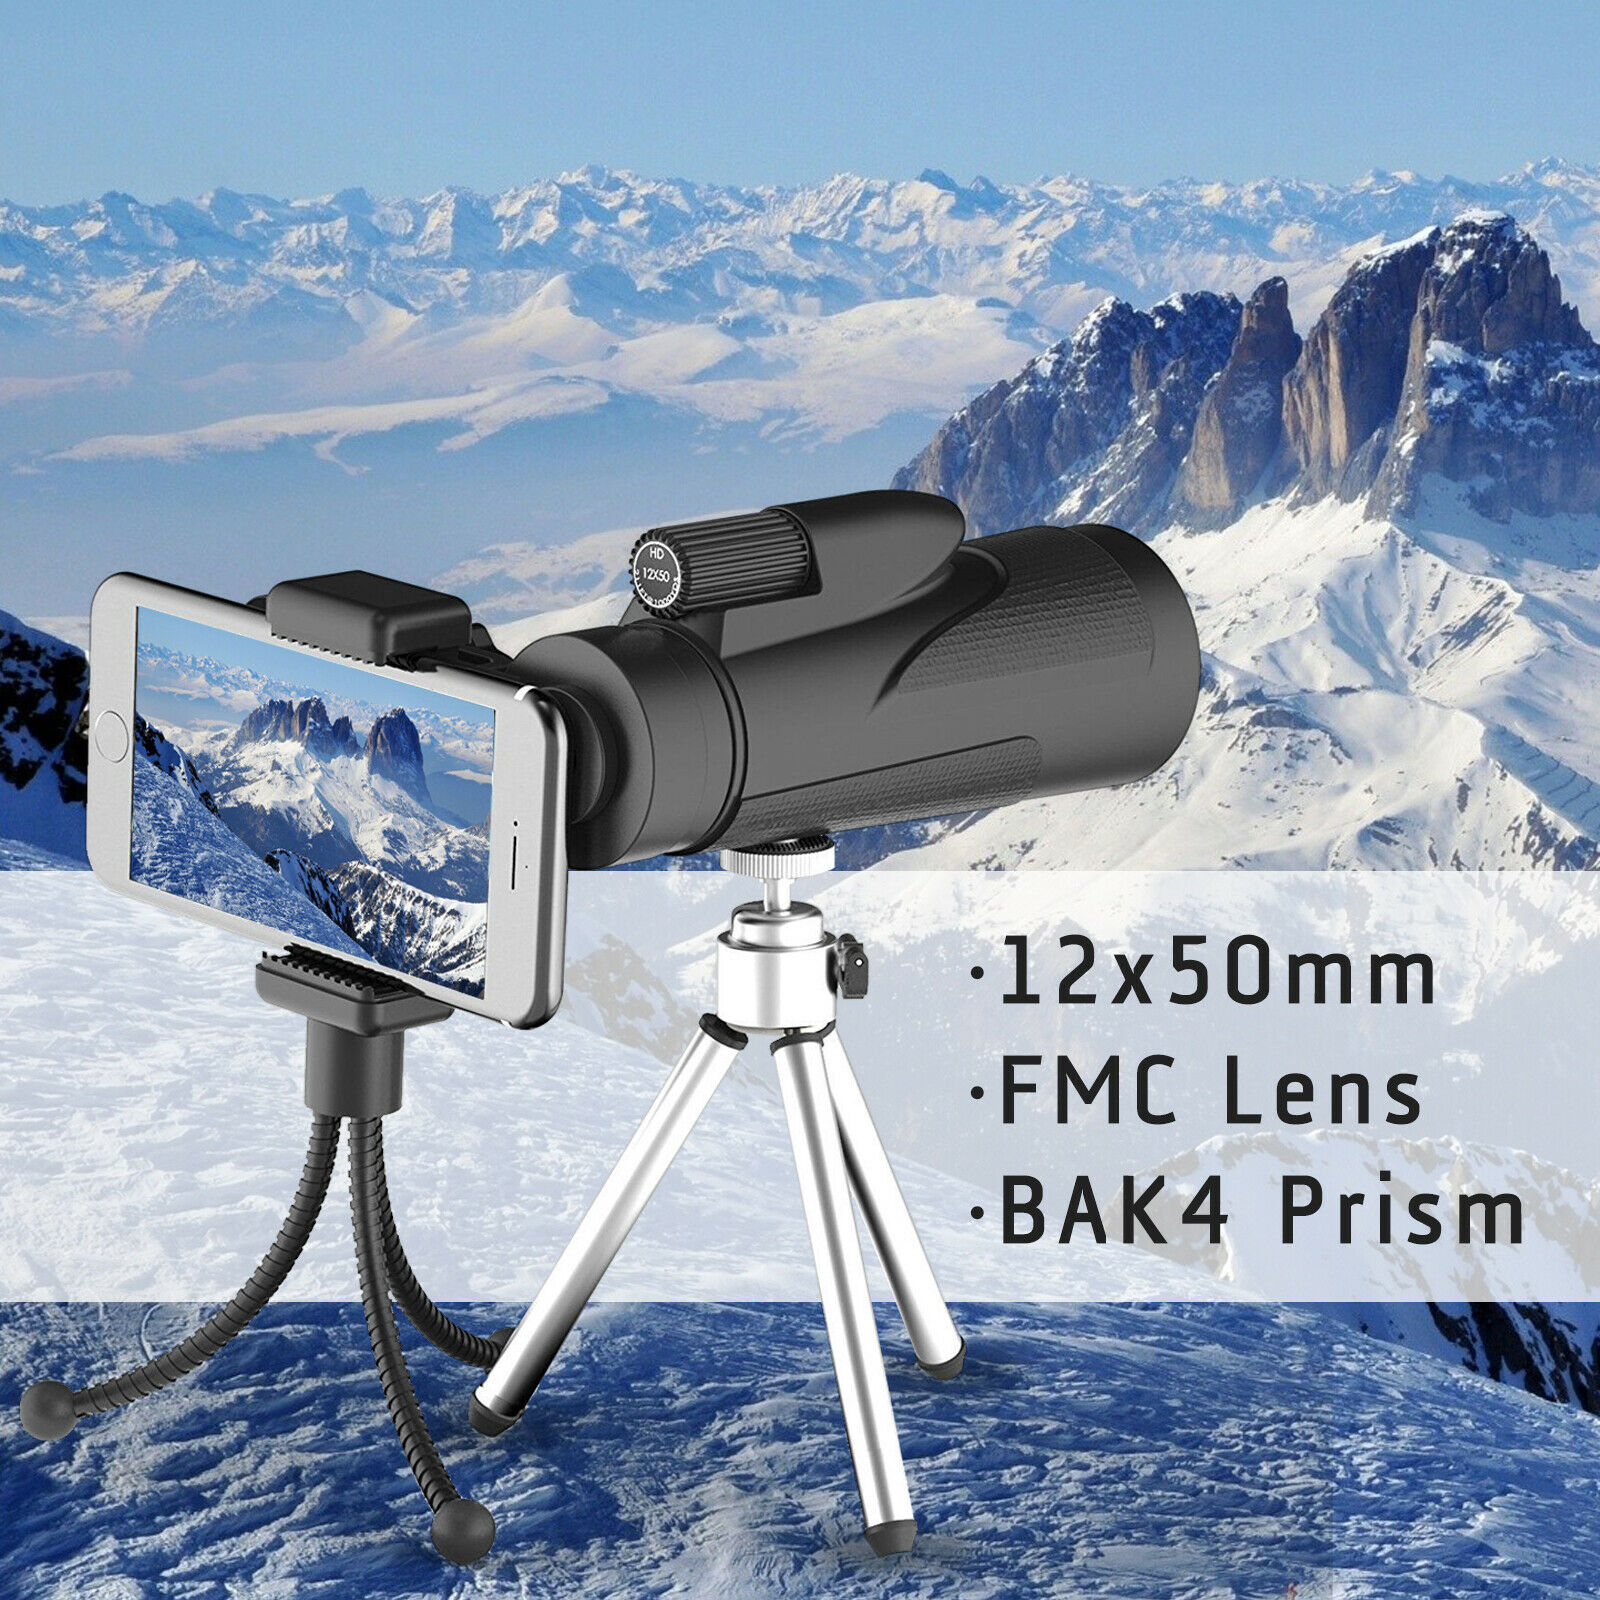 12x50 High Power BAK-4 Prism Monocular Telescope FMC Lens+Tr